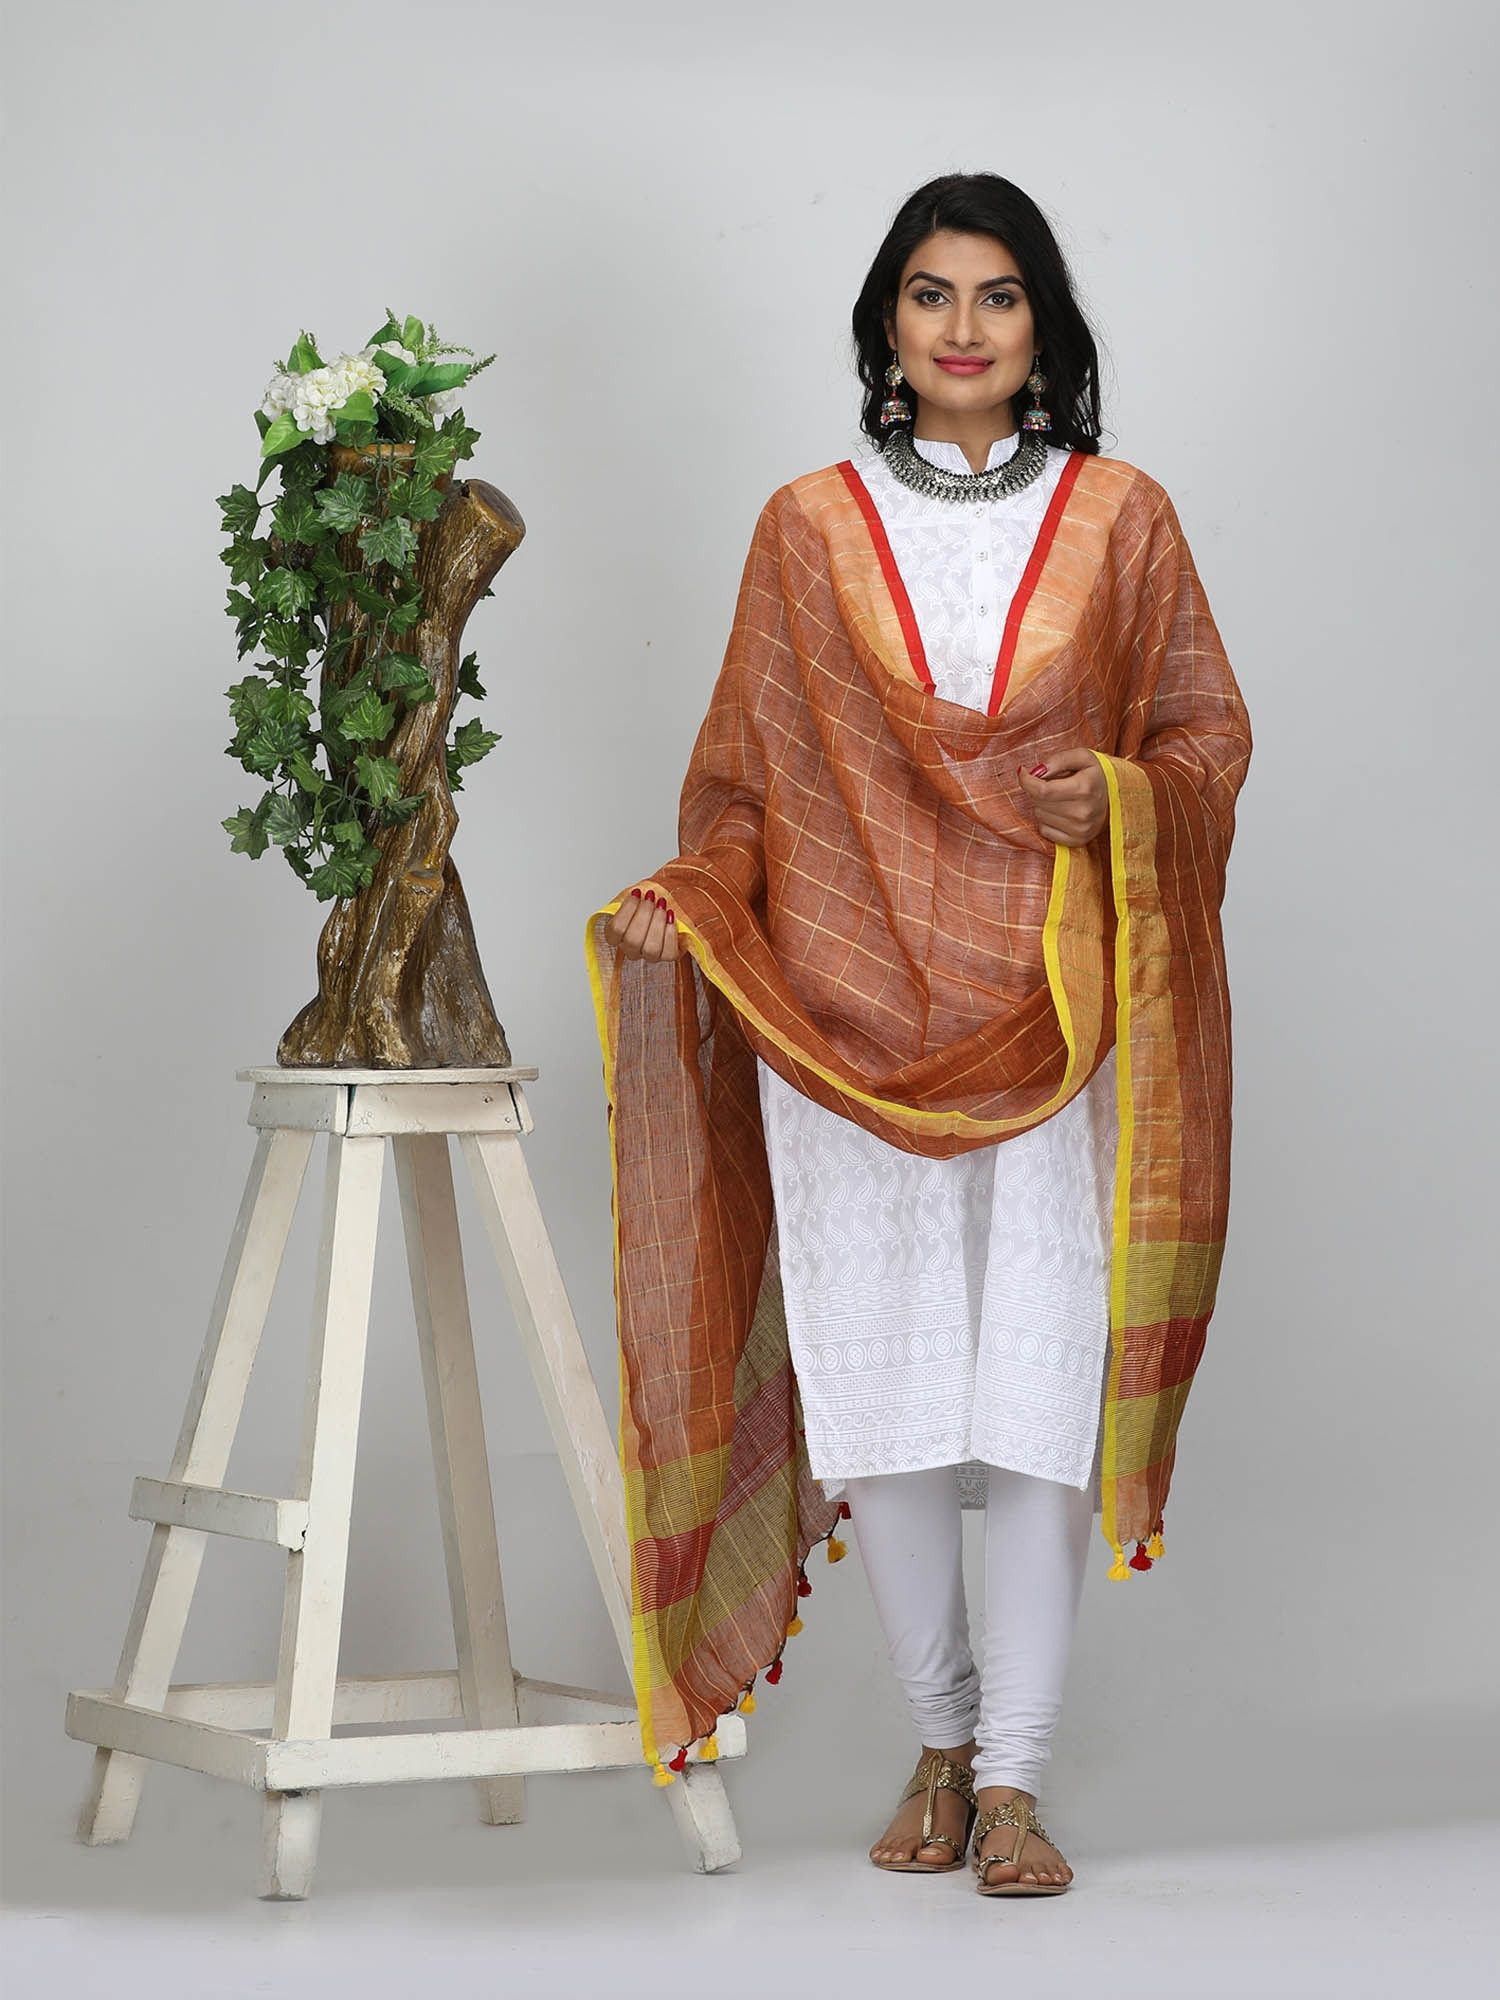 The Weave Traveller Handloom Hand Woven Linen Zari Checkered Dupatta With Pom Pom Edgings